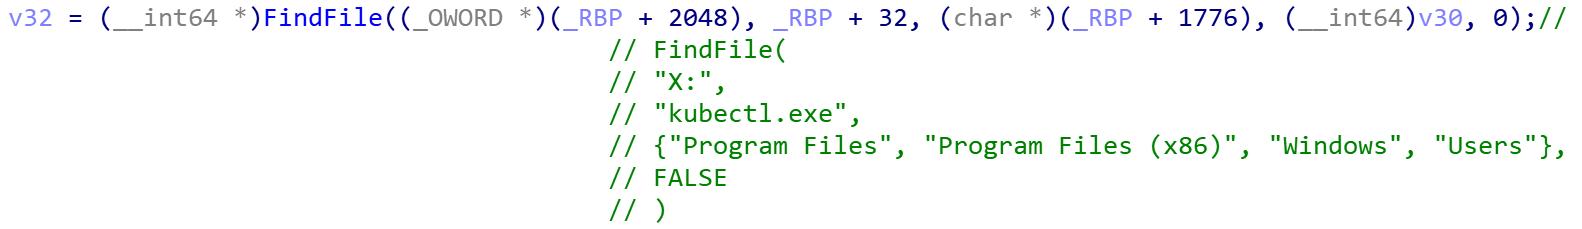 Siloscapeがkubectl.exeのバイナリを検索